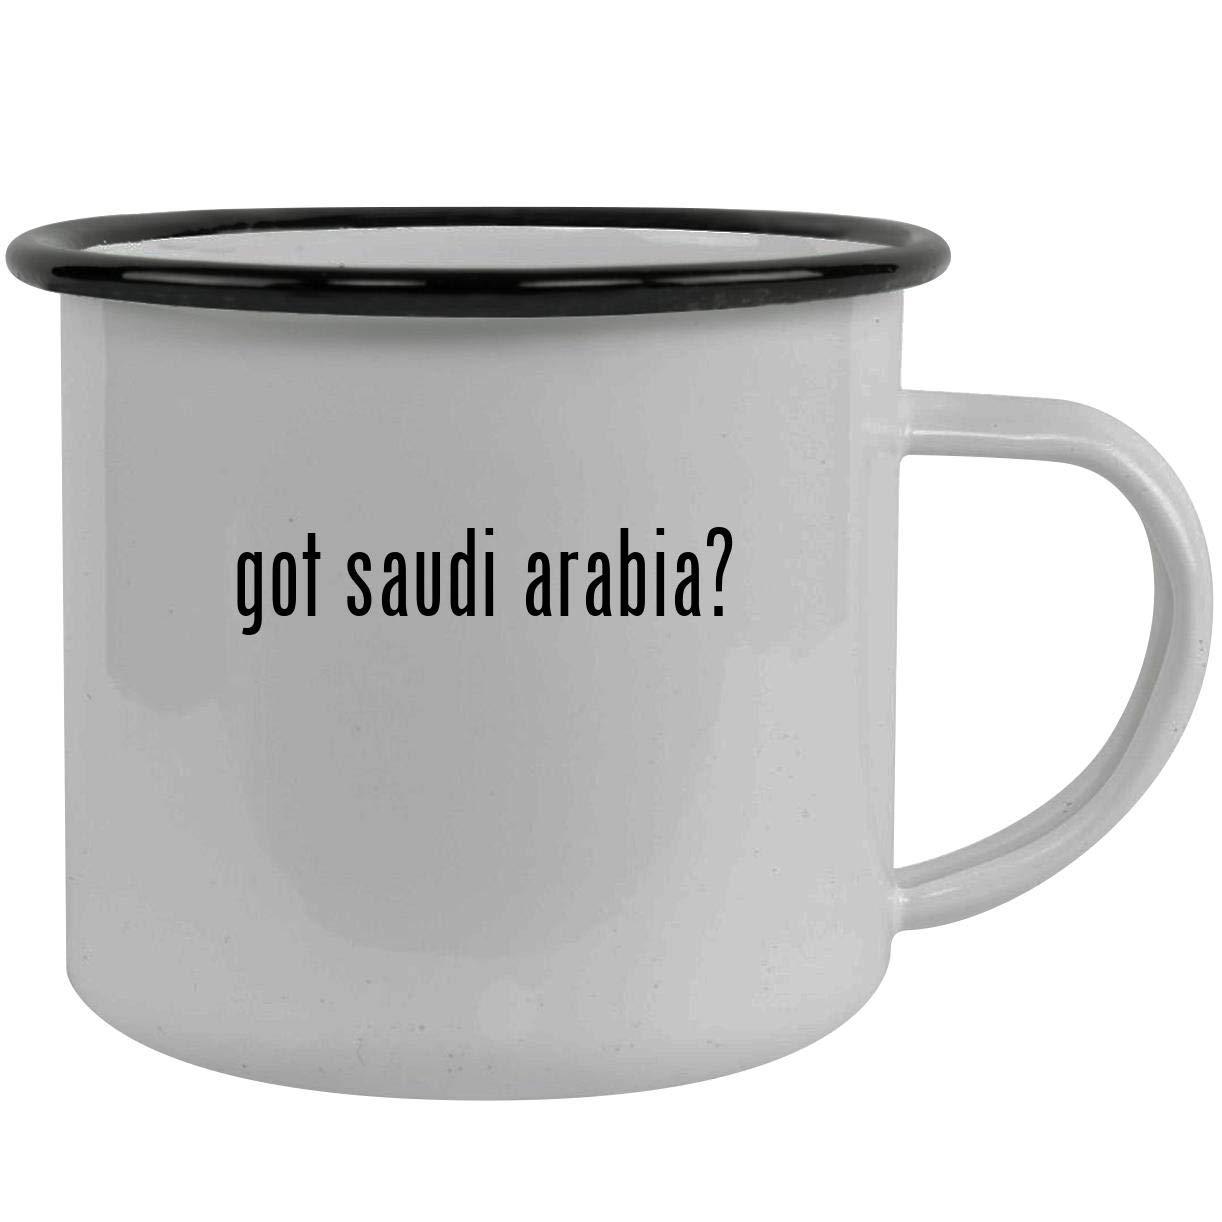 got saudi arabia? - Stainless Steel 12oz Camping Mug, Black